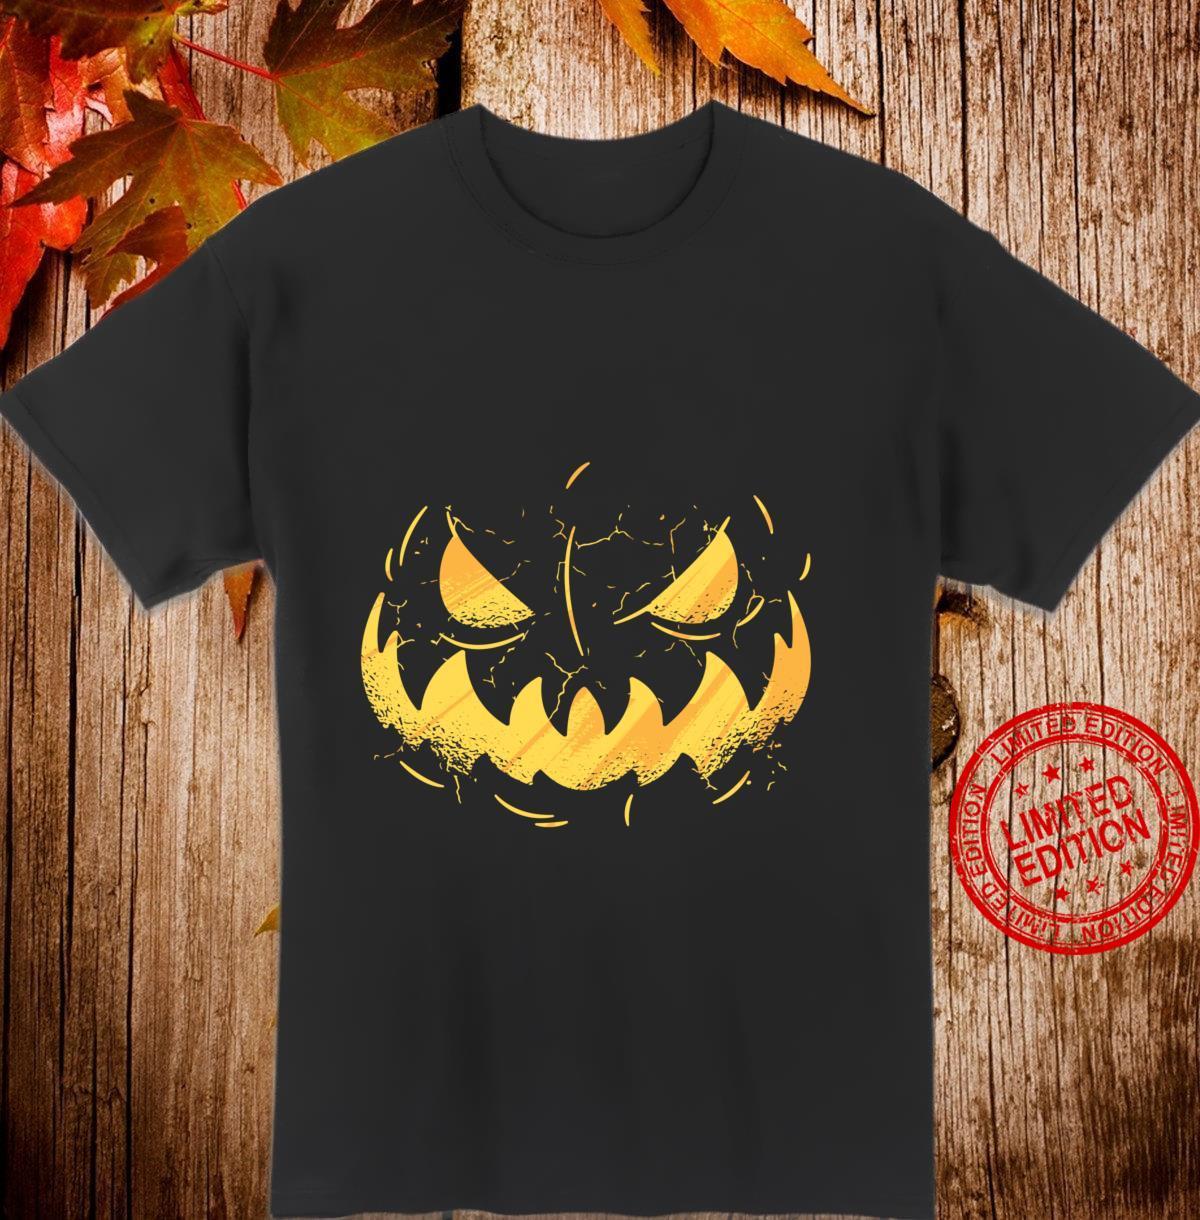 Jack O' Lantern Face Halloween Pumpkin Costume Unisex Shirt